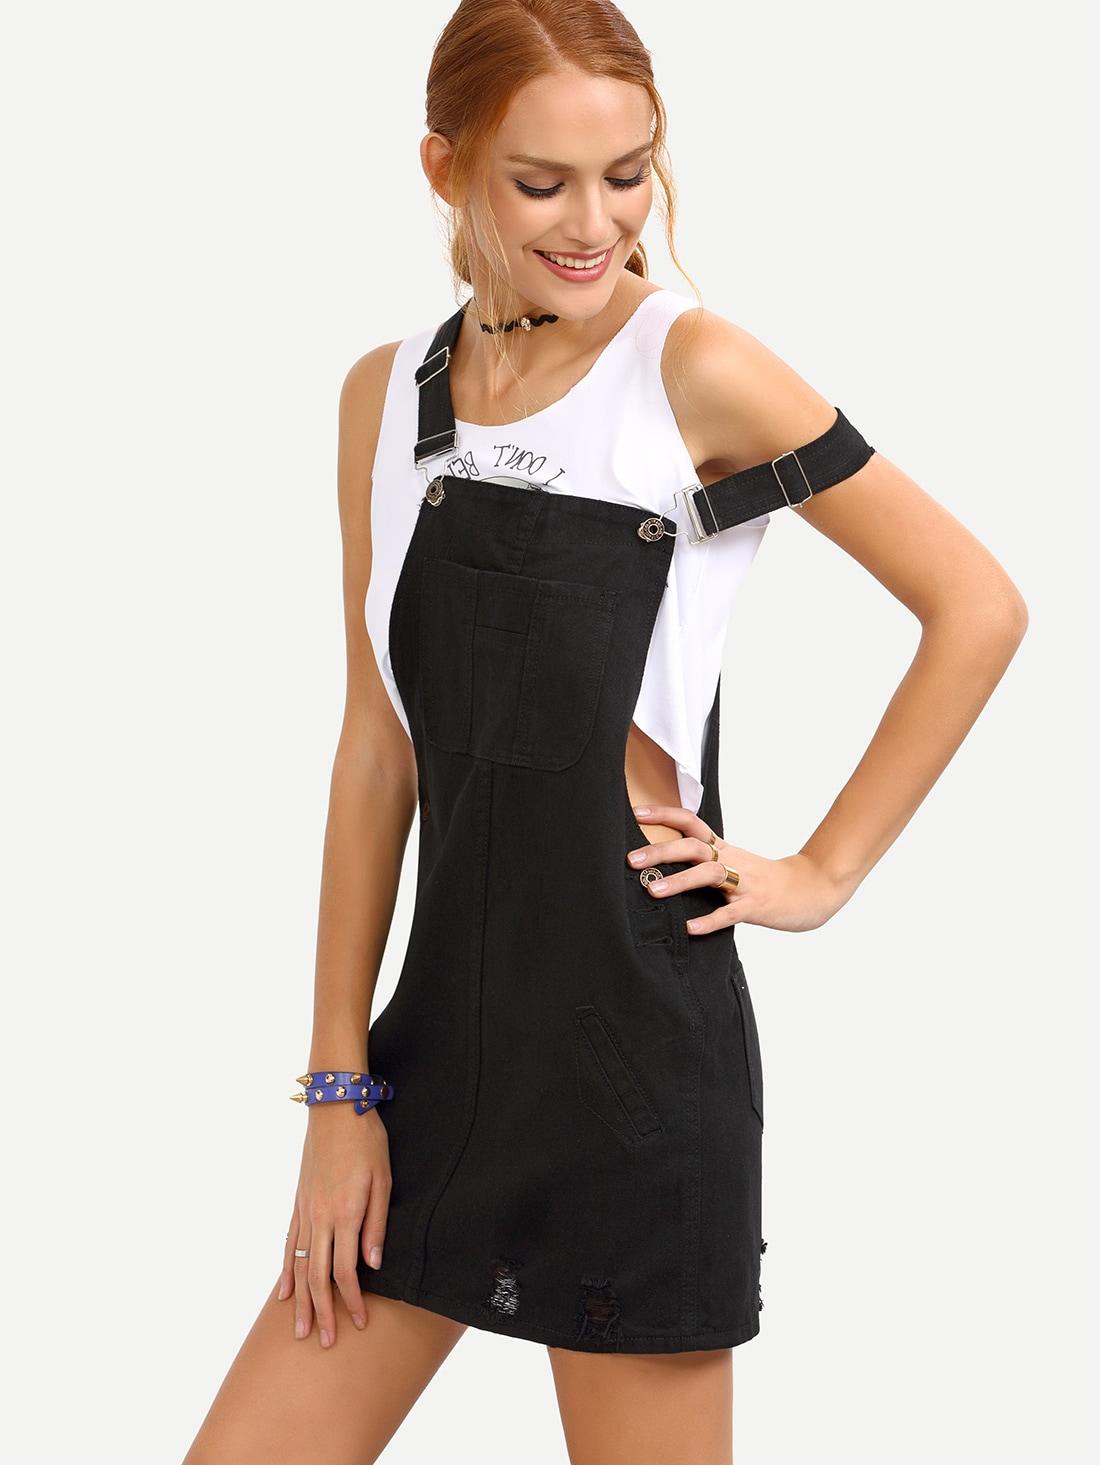 Ripped Black Denim Overall Dress dress160527008